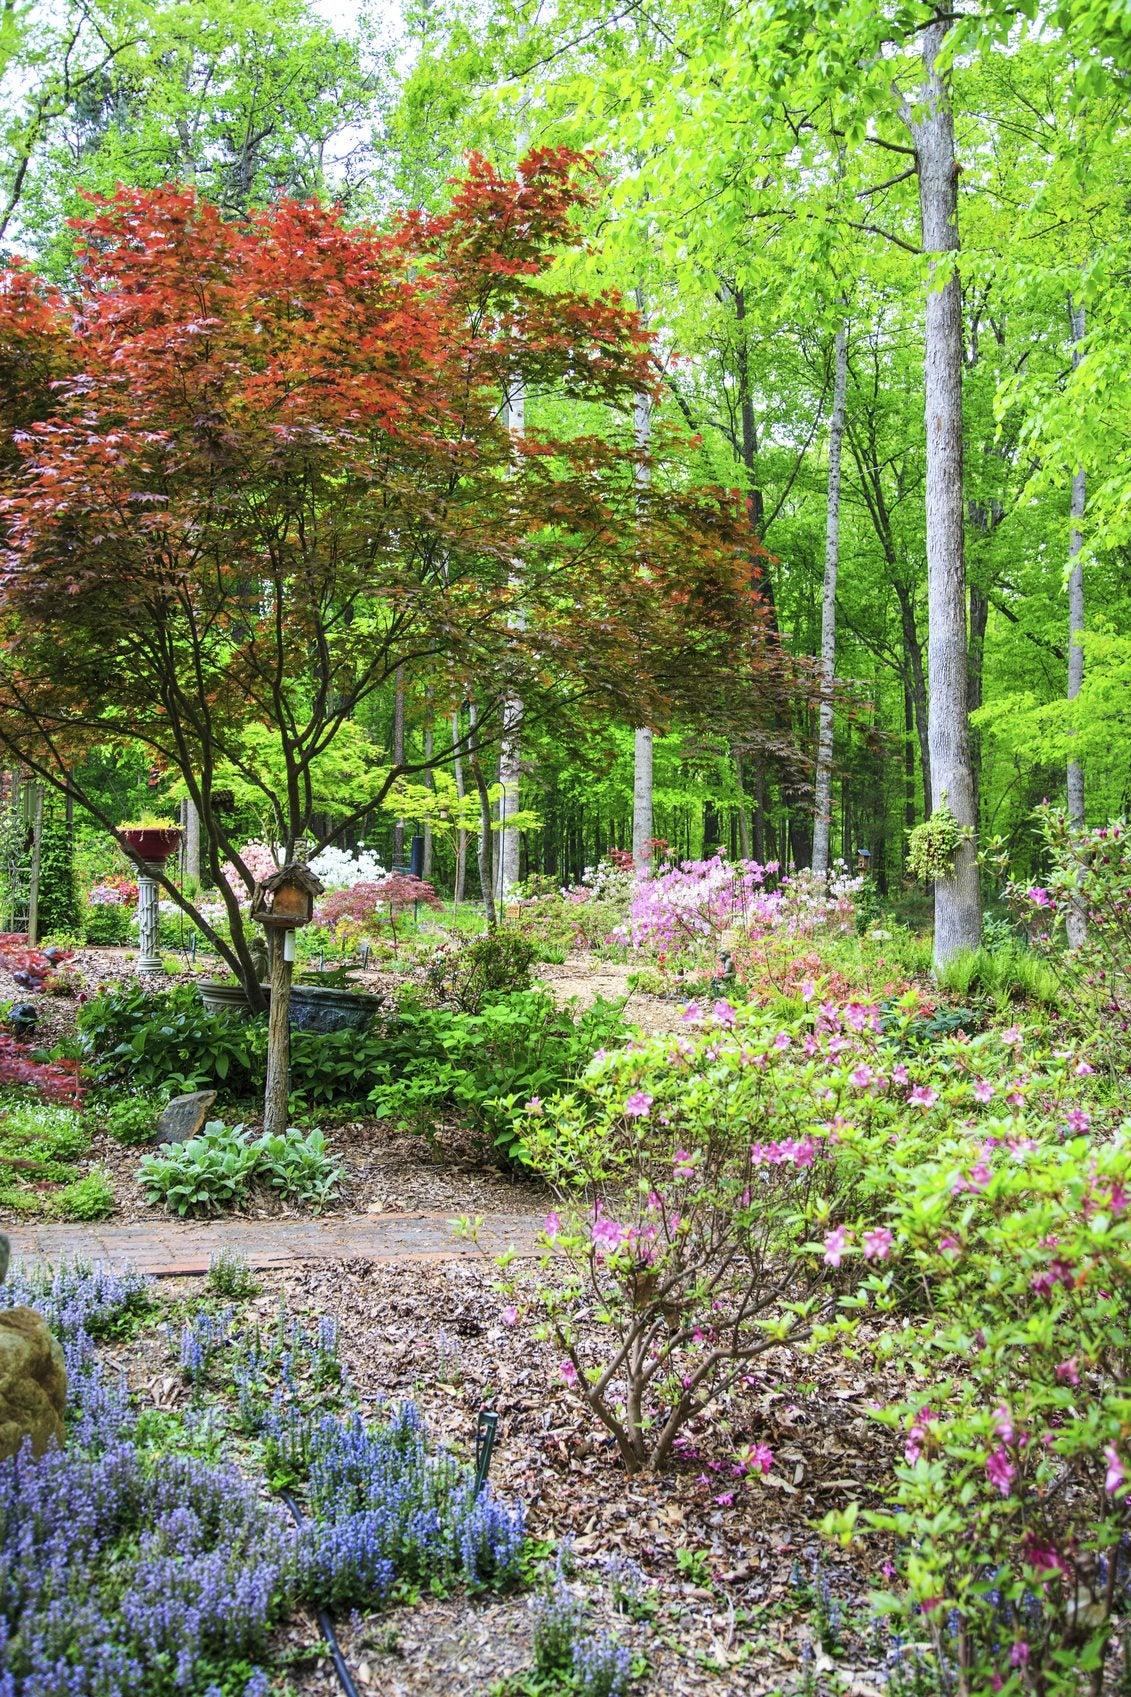 Tips On Gardening In Zone 10 - Garden Tips For Zone 10 Regions